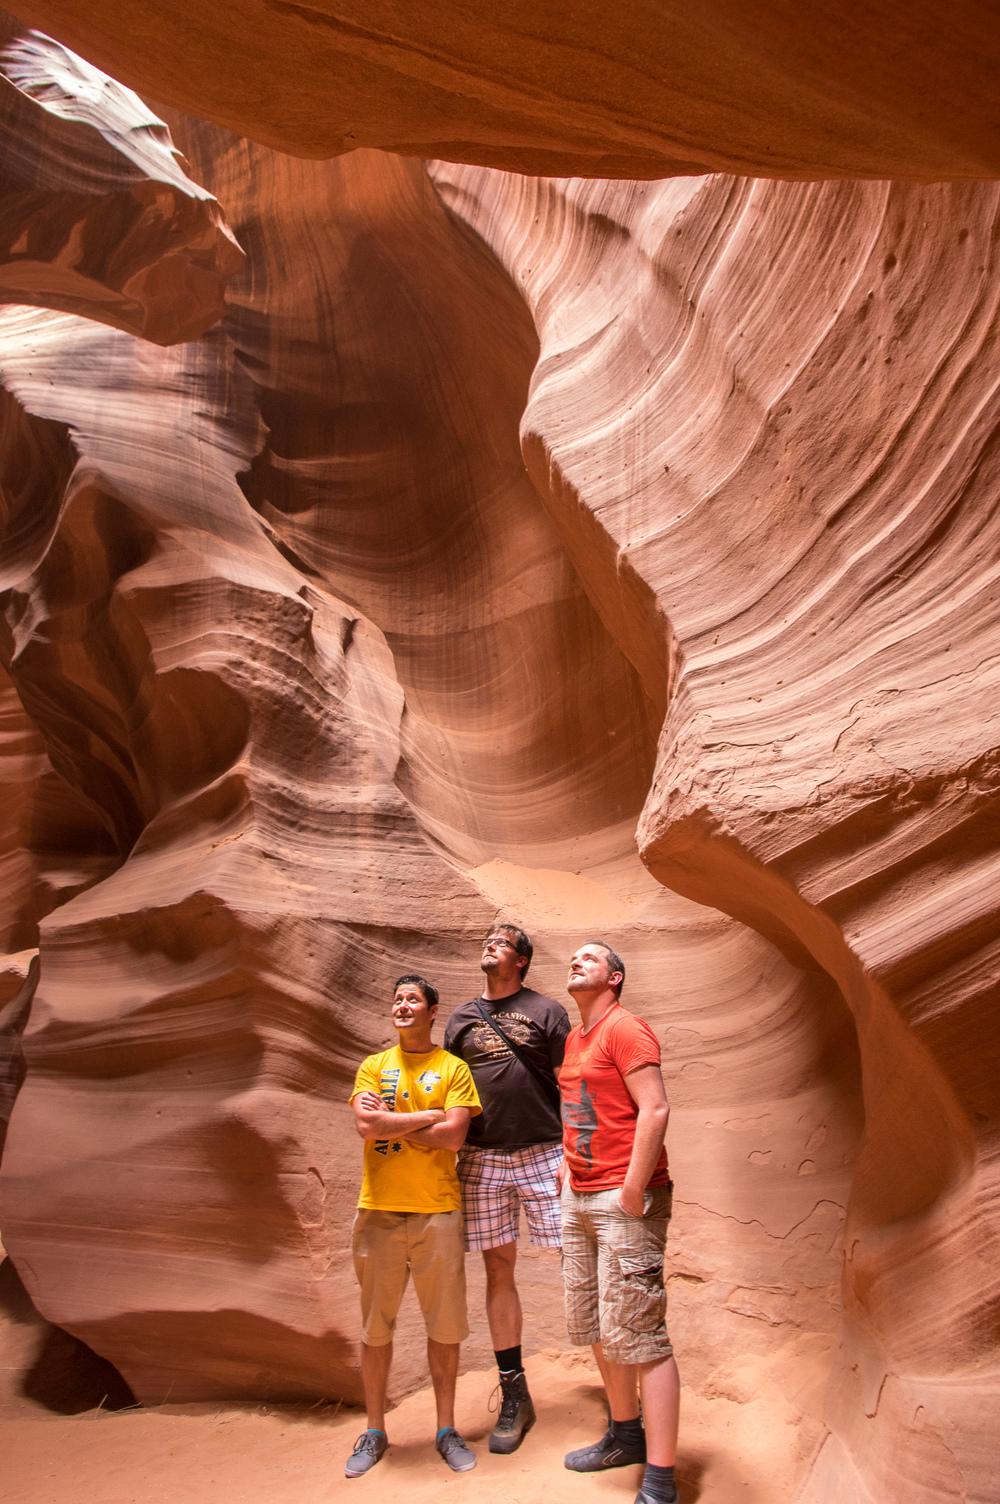 Unser Navajo Guide hat uns immer wieder fotogen platziert.